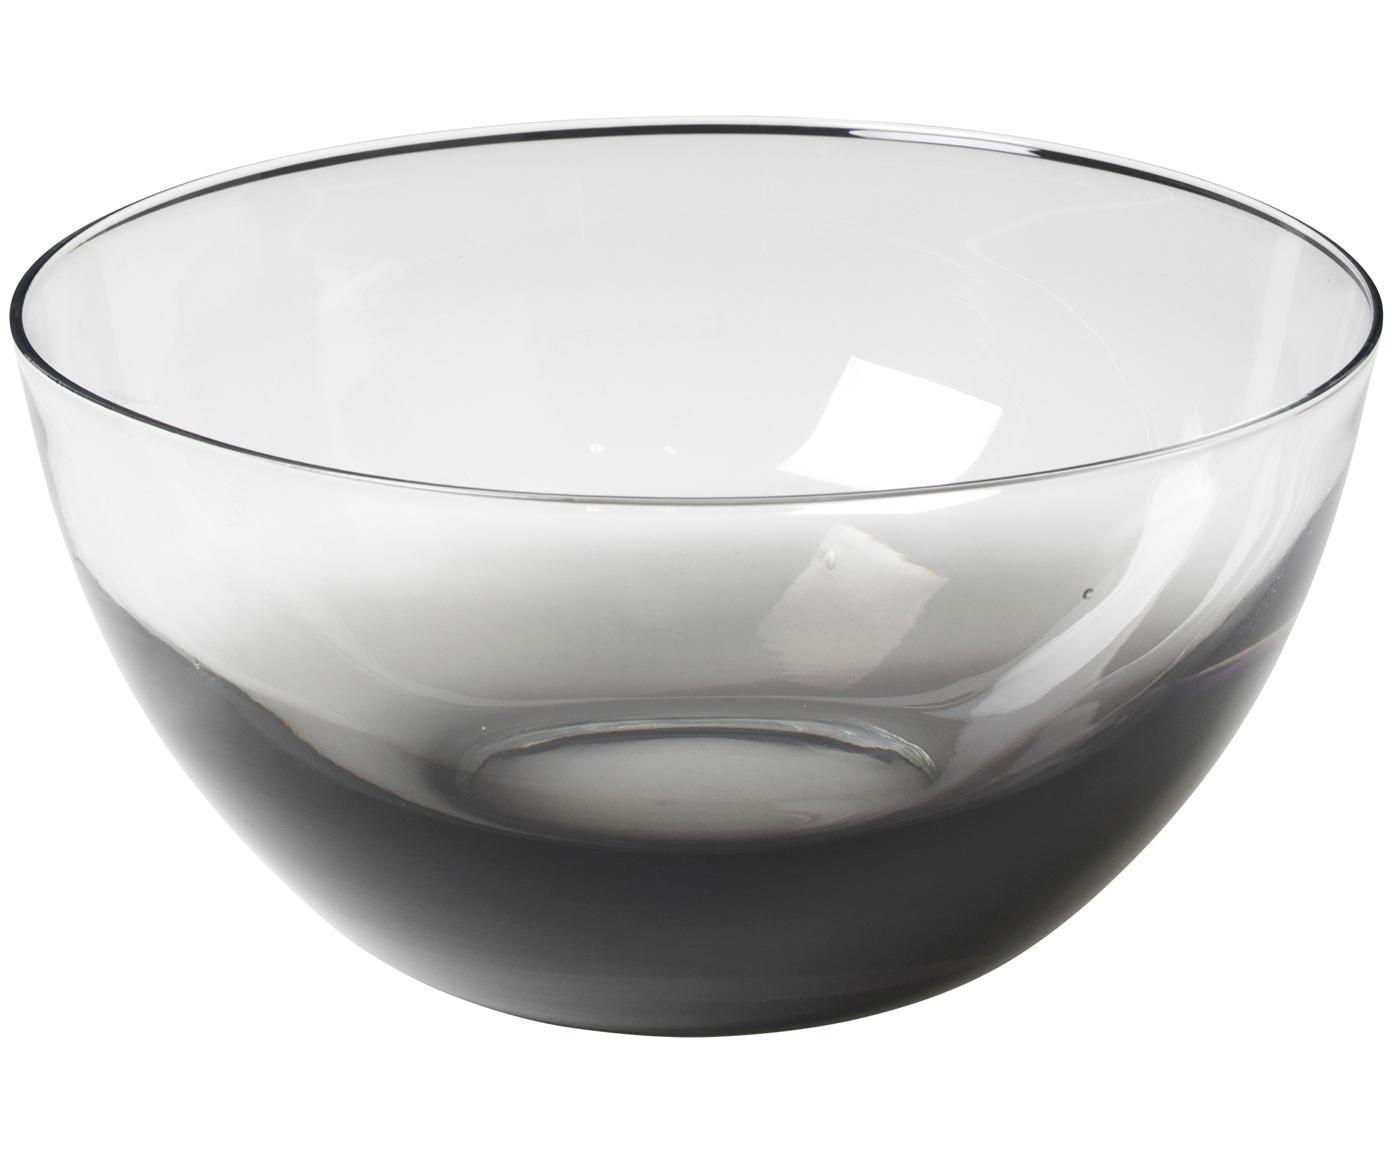 Mondgeblazen serveerschaal Smoke, Glas, Fumé, transparant, Ø 25 x H 12 cm